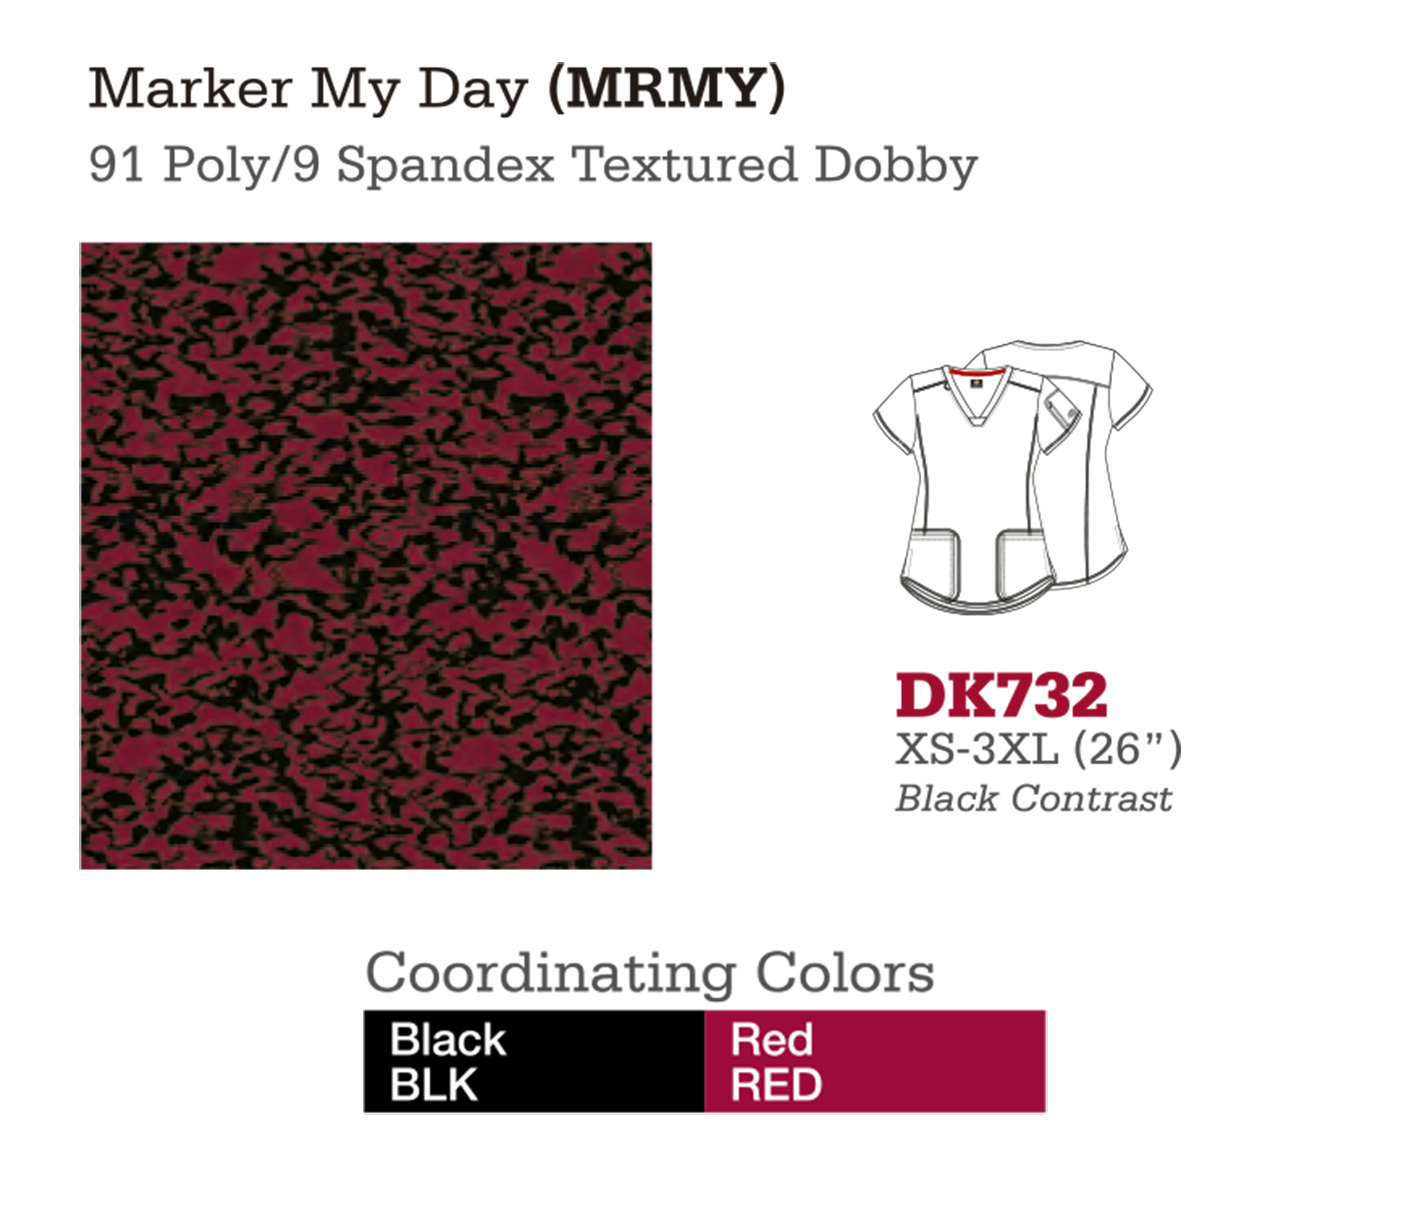 Marker My Day. DK732.